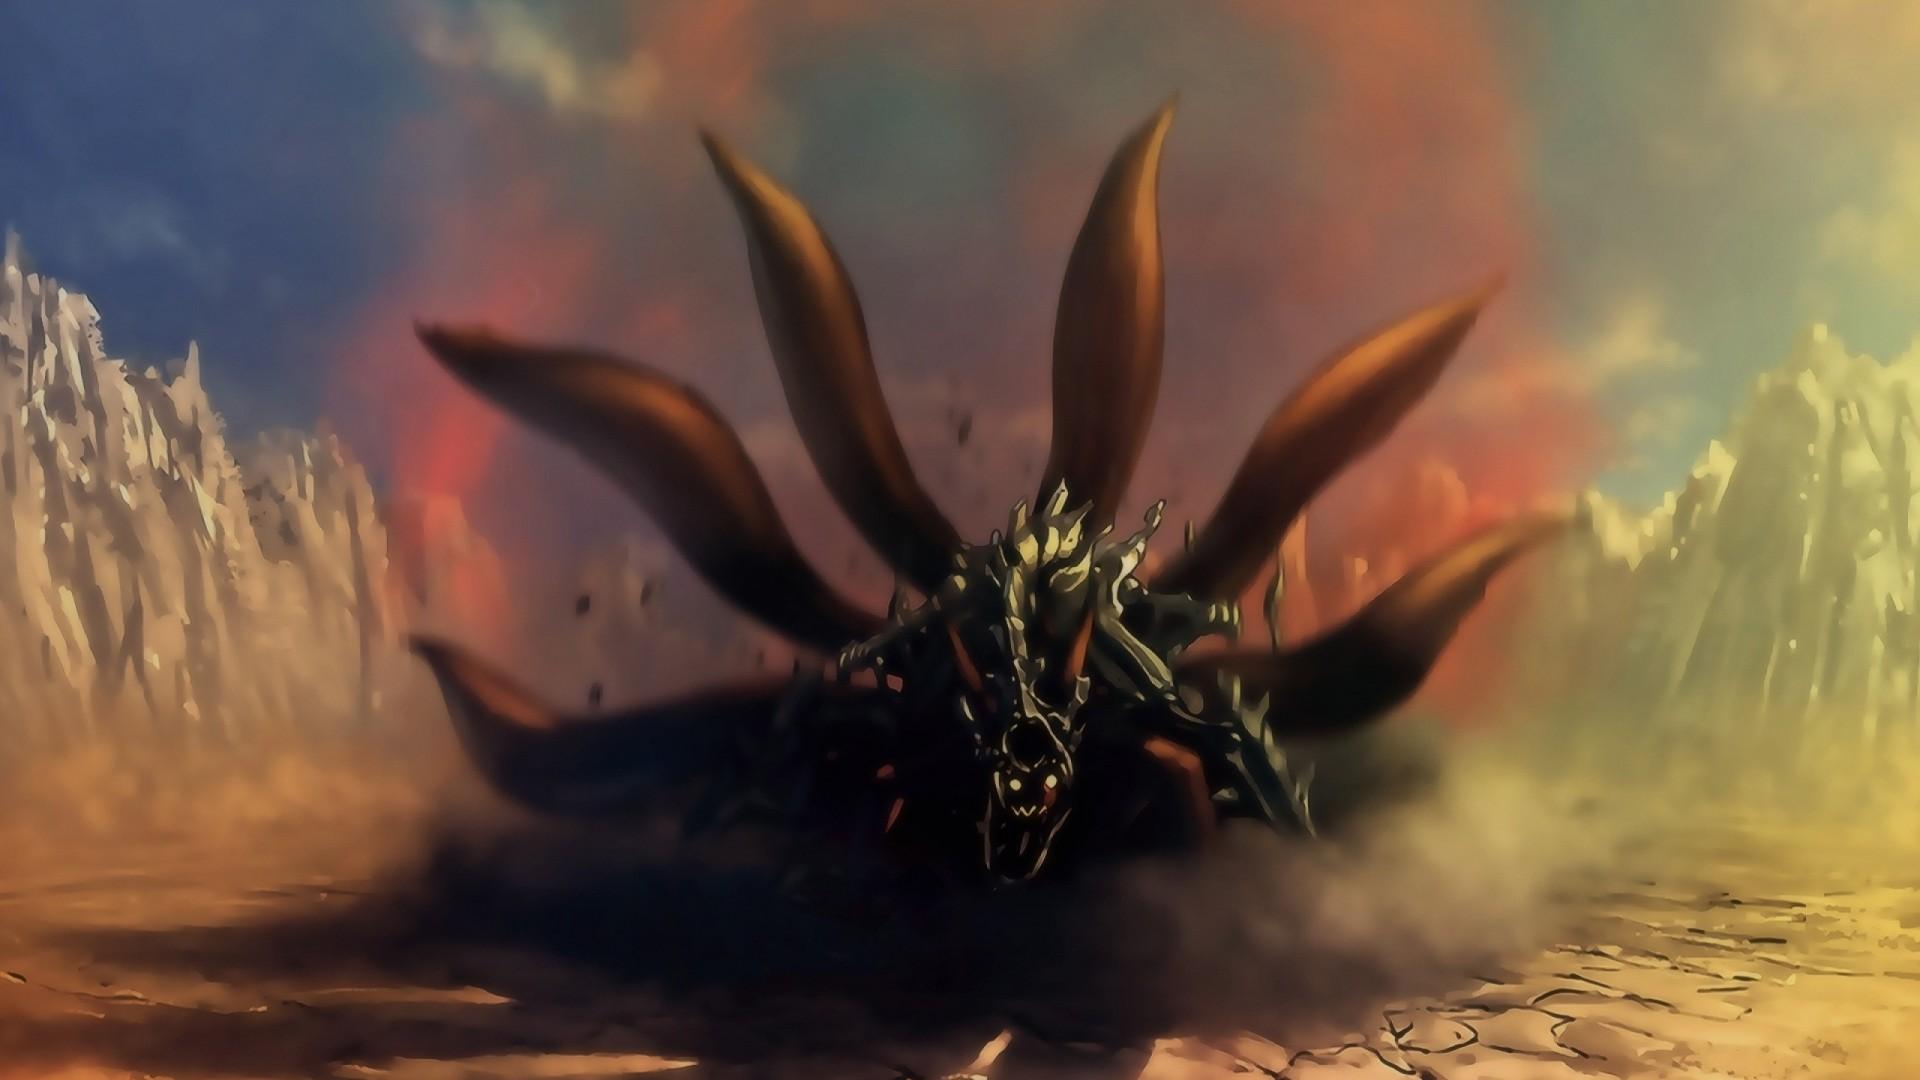 A23 Naruto Uzumaki anime HD Desktop background wallpapers downloads